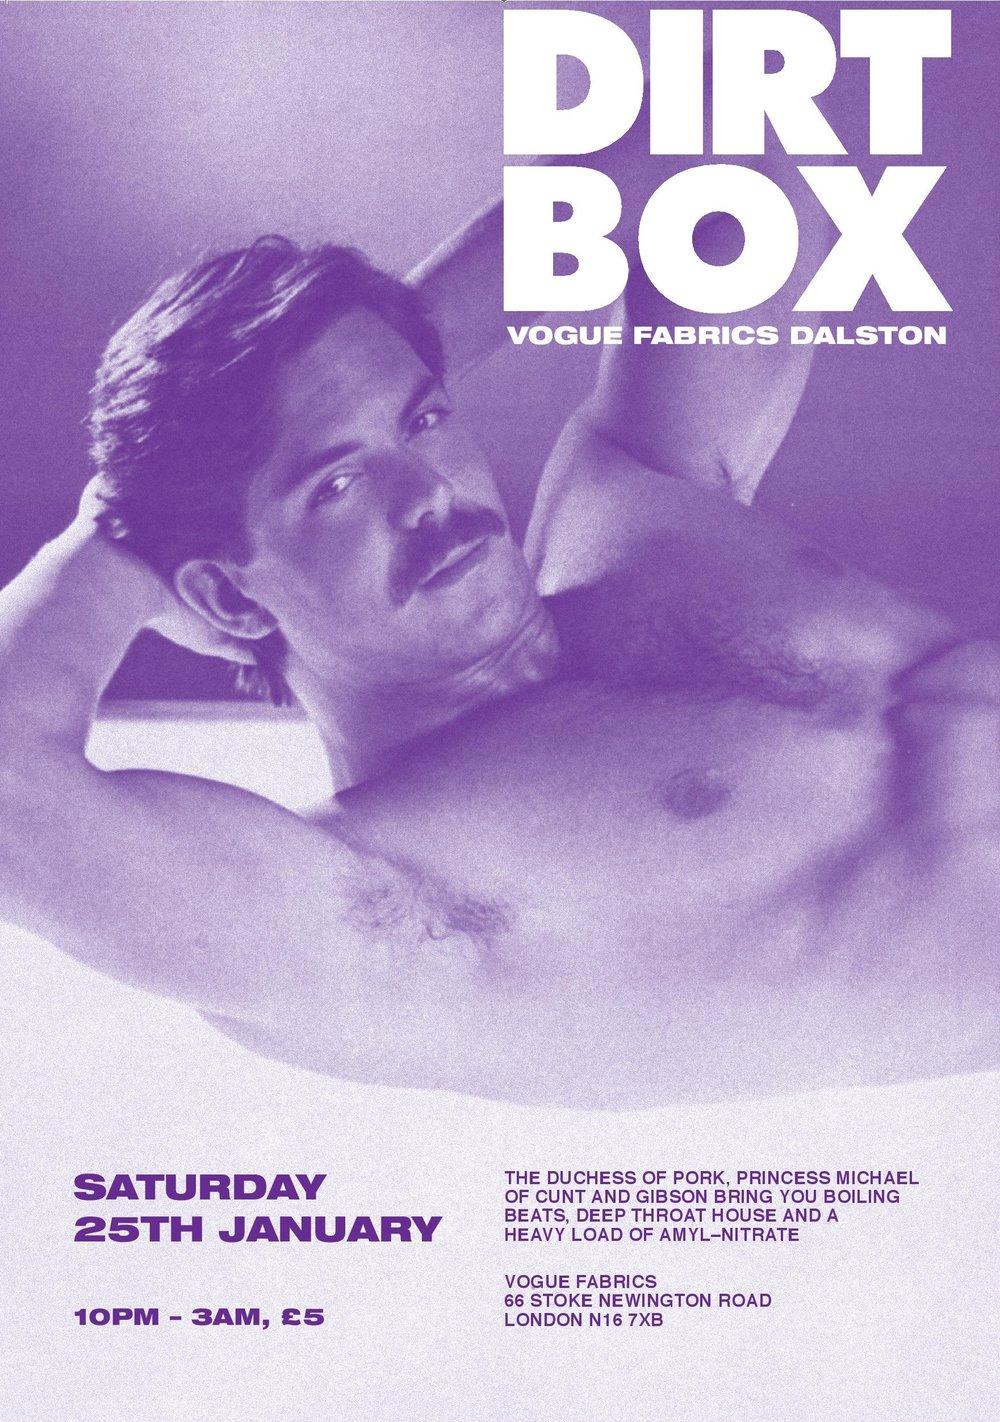 DirtBox-Jan-14-Poster.jpg